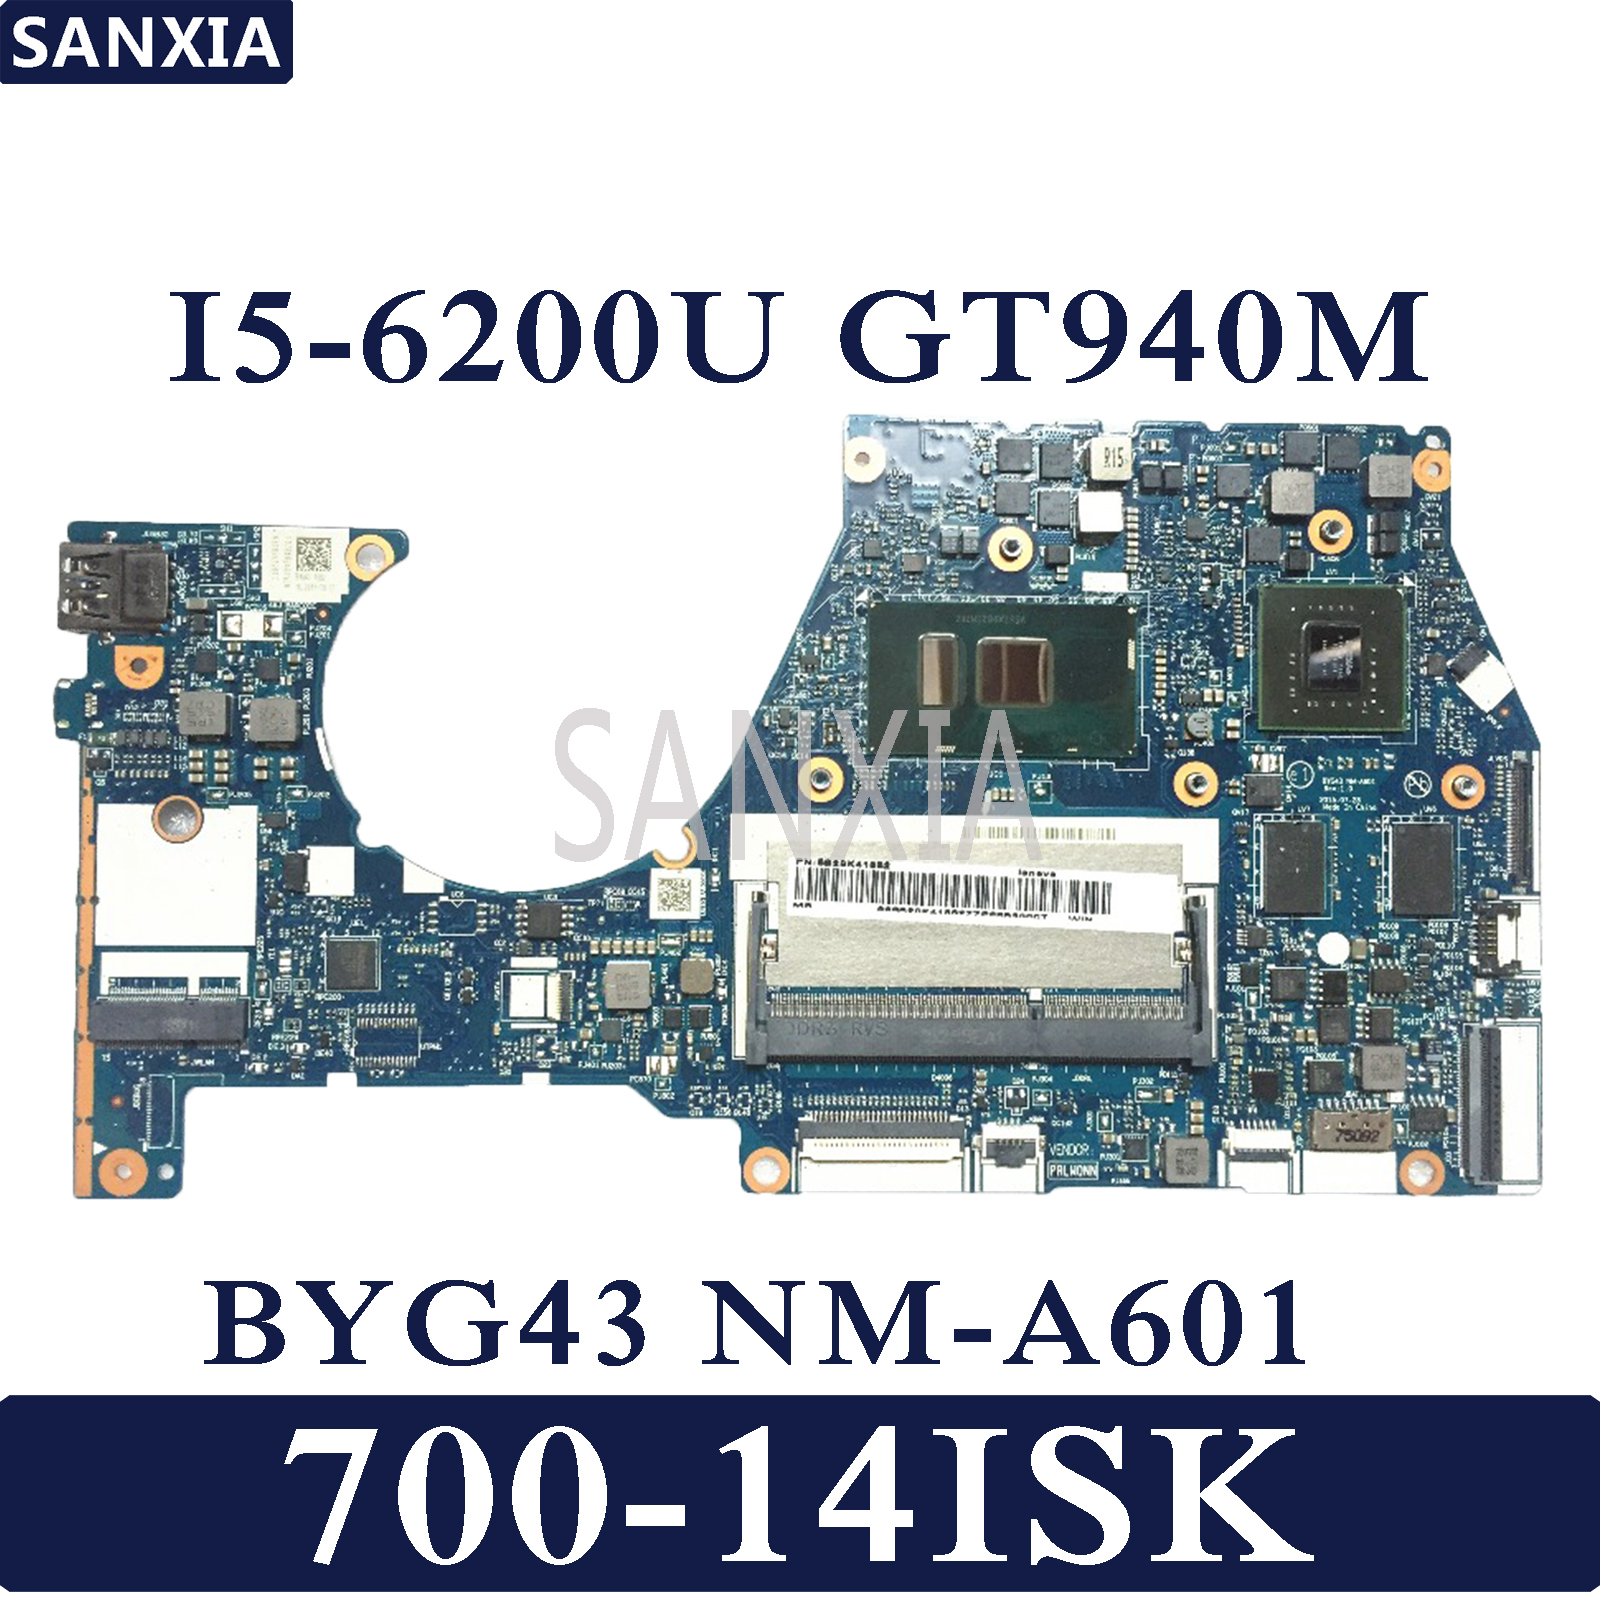 KEFU BYG43 NM-A601 Laptop motherboard para Lenovo YOGA 700-14ISK mainboard original I5-6200U GT940MX